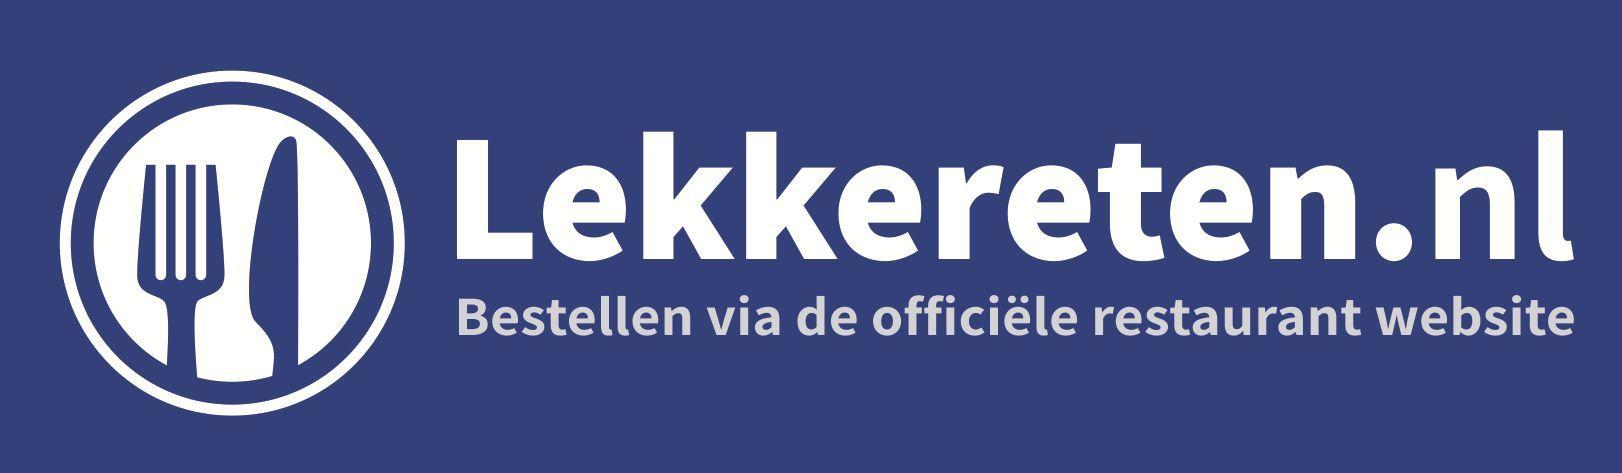 Contact | Lekkereten.nl